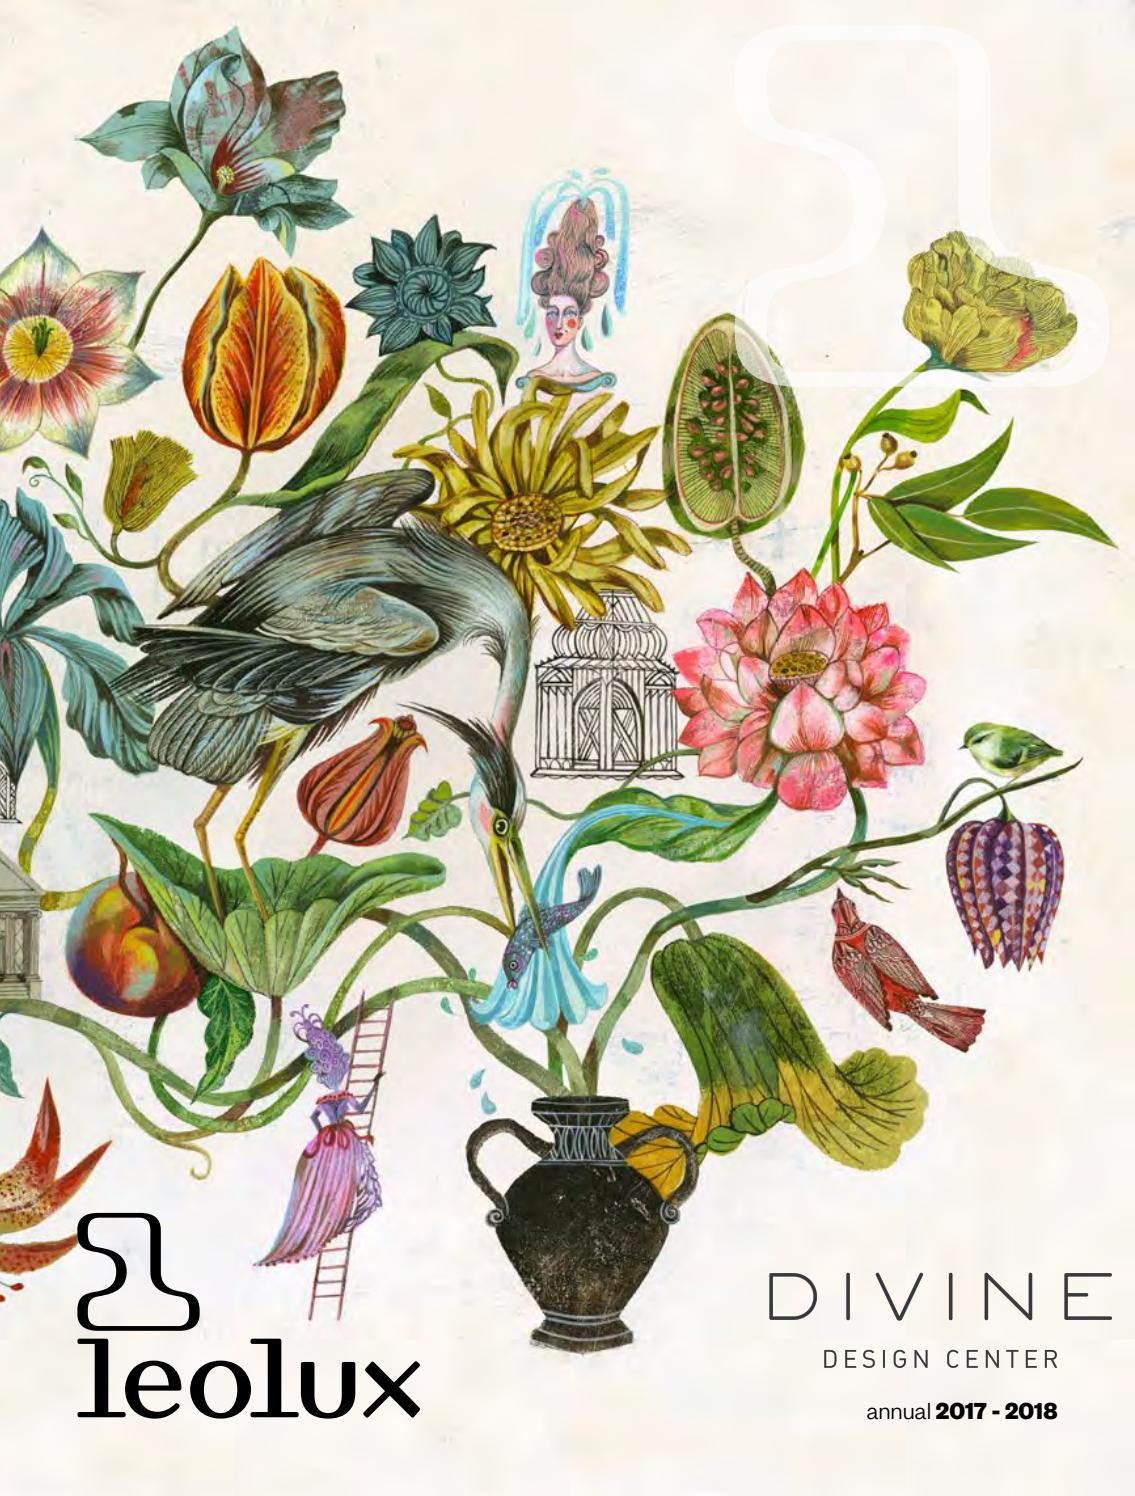 Design Salontafel Leolux.Divine Design Center Leolux 2018 Catalog By Divine Design